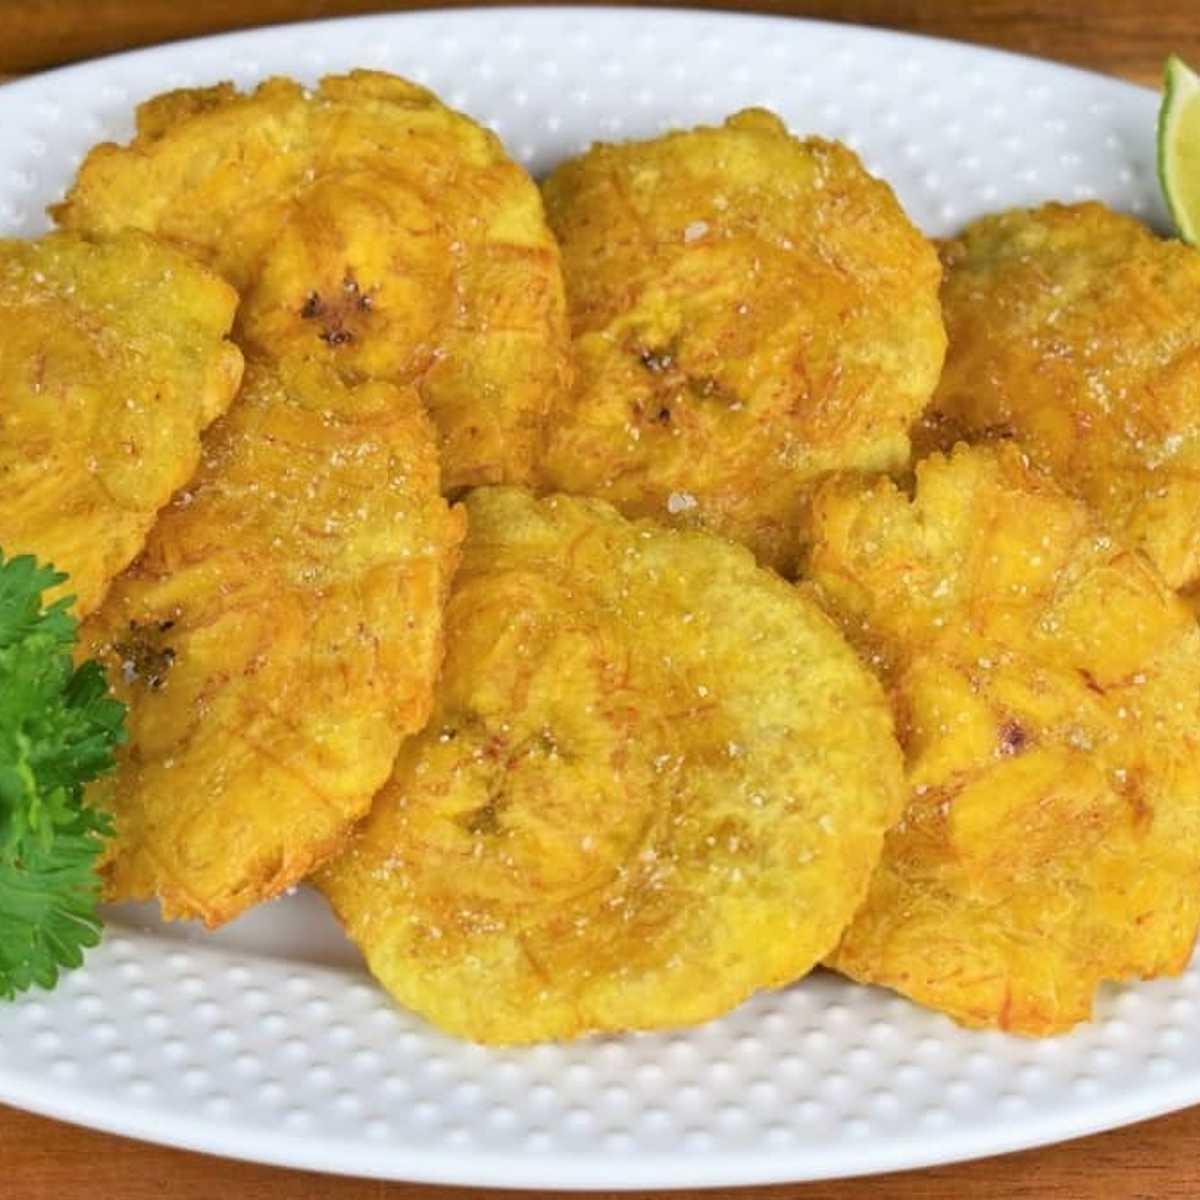 Cibao Kitchen Delivery Takeout 310 Daniel Webster Highway Nashua Menu Prices Doordash